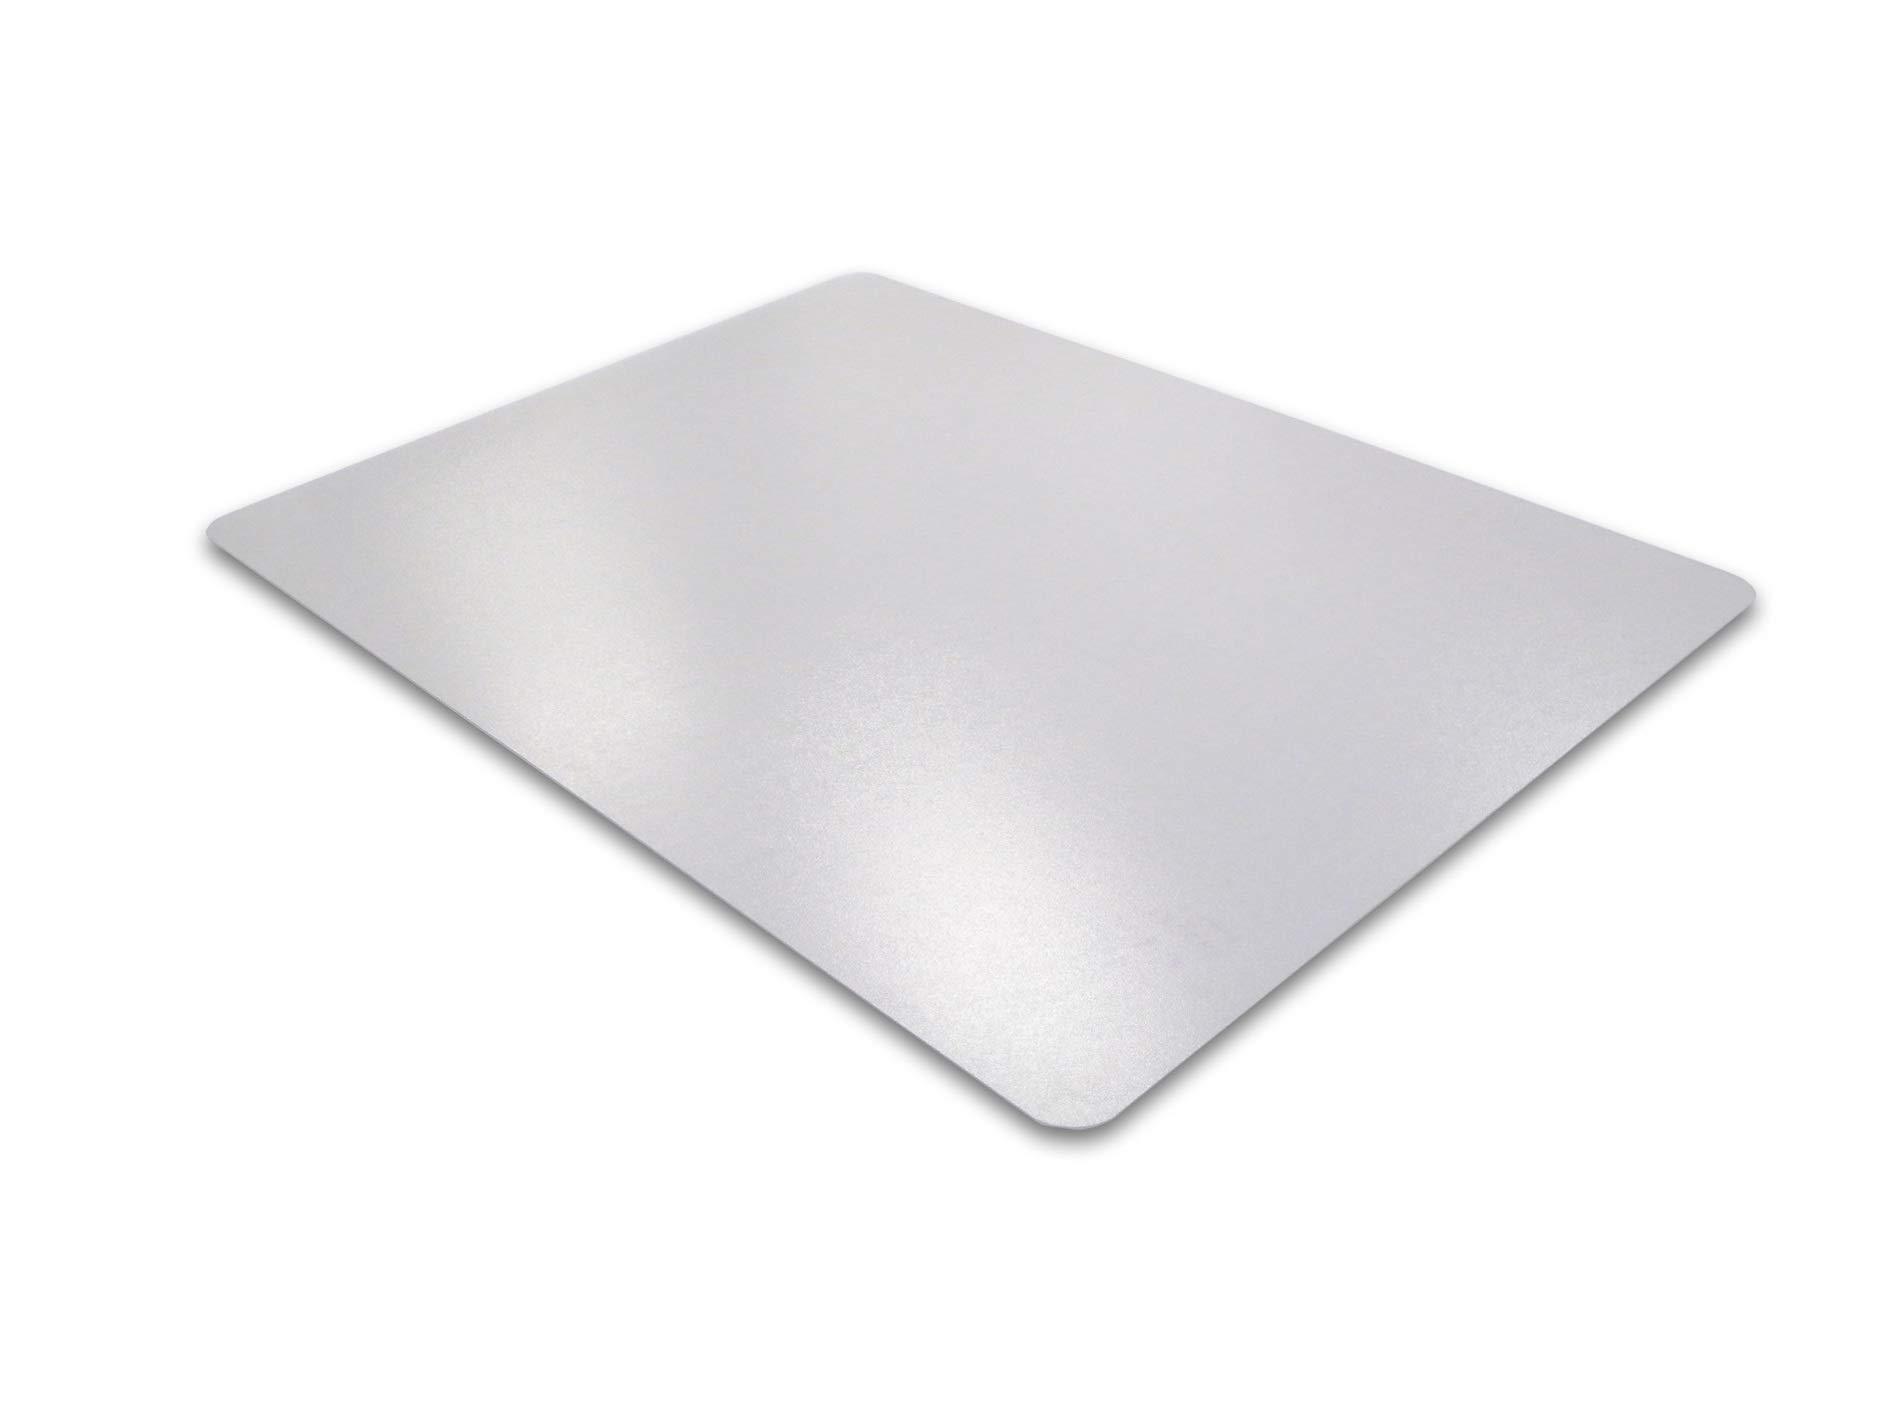 Cleartex UnoMat, Anti-Slip Chair Mat, For Polished Hard Floors/Carpet Tiles, Rectangular, 48'' x 60'' (FR1215020ERA)